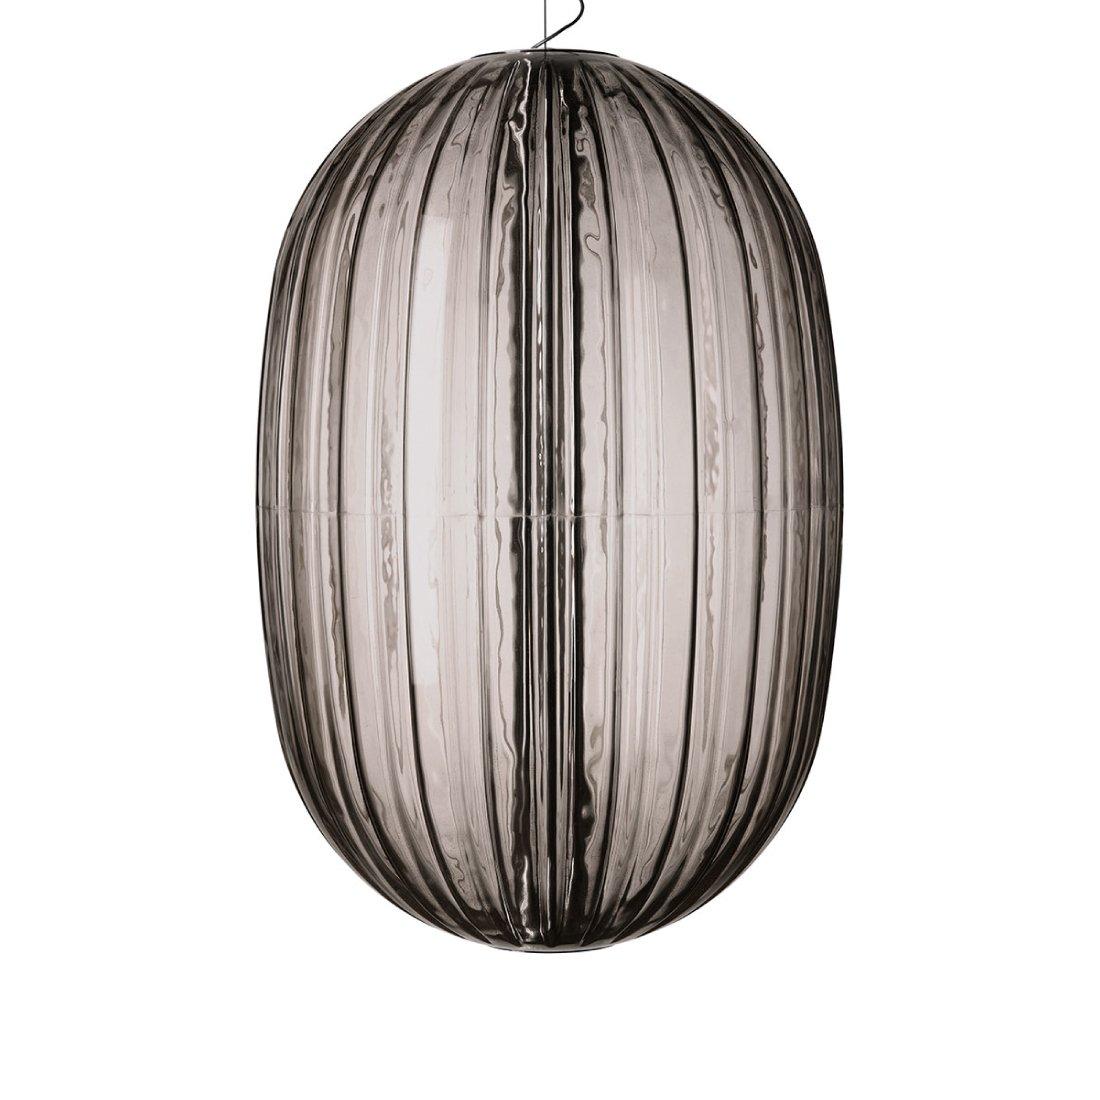 Foscarini Plass Media Hanglamp Grijs 190 cm.